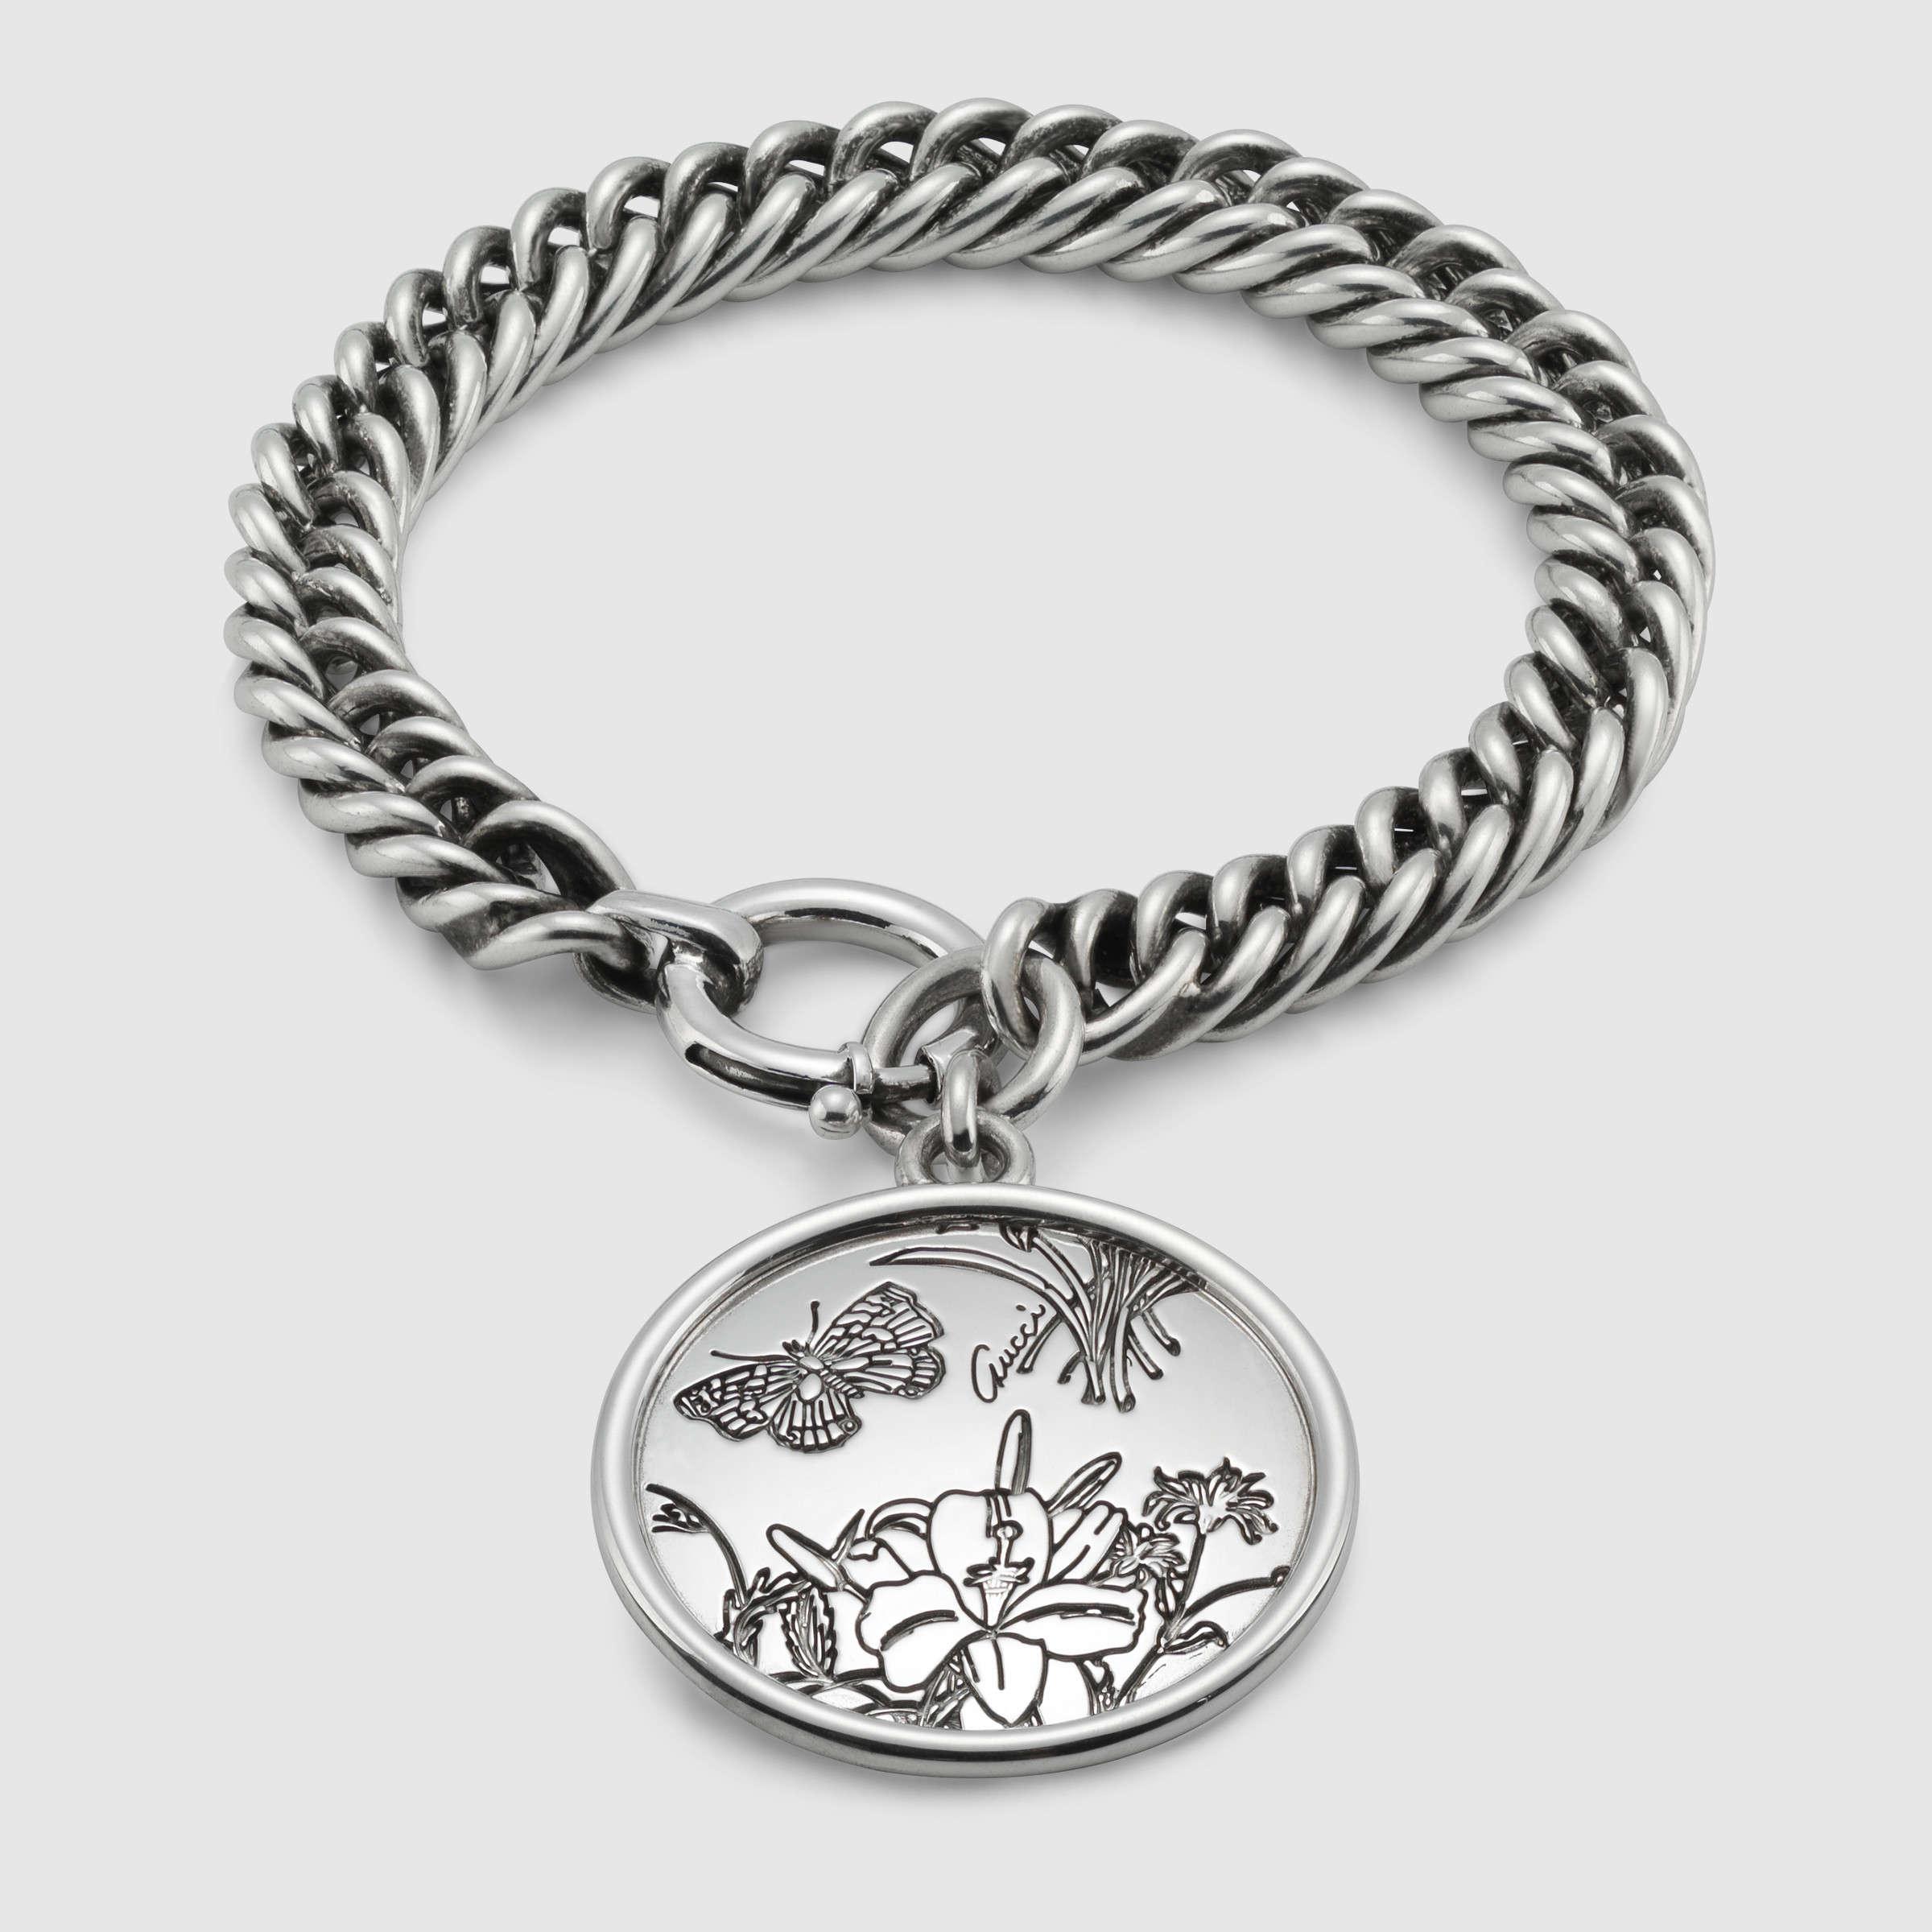 c5a8e8e8b Gucci Flora Bracelet In Sterling Silver in Metallic - Lyst